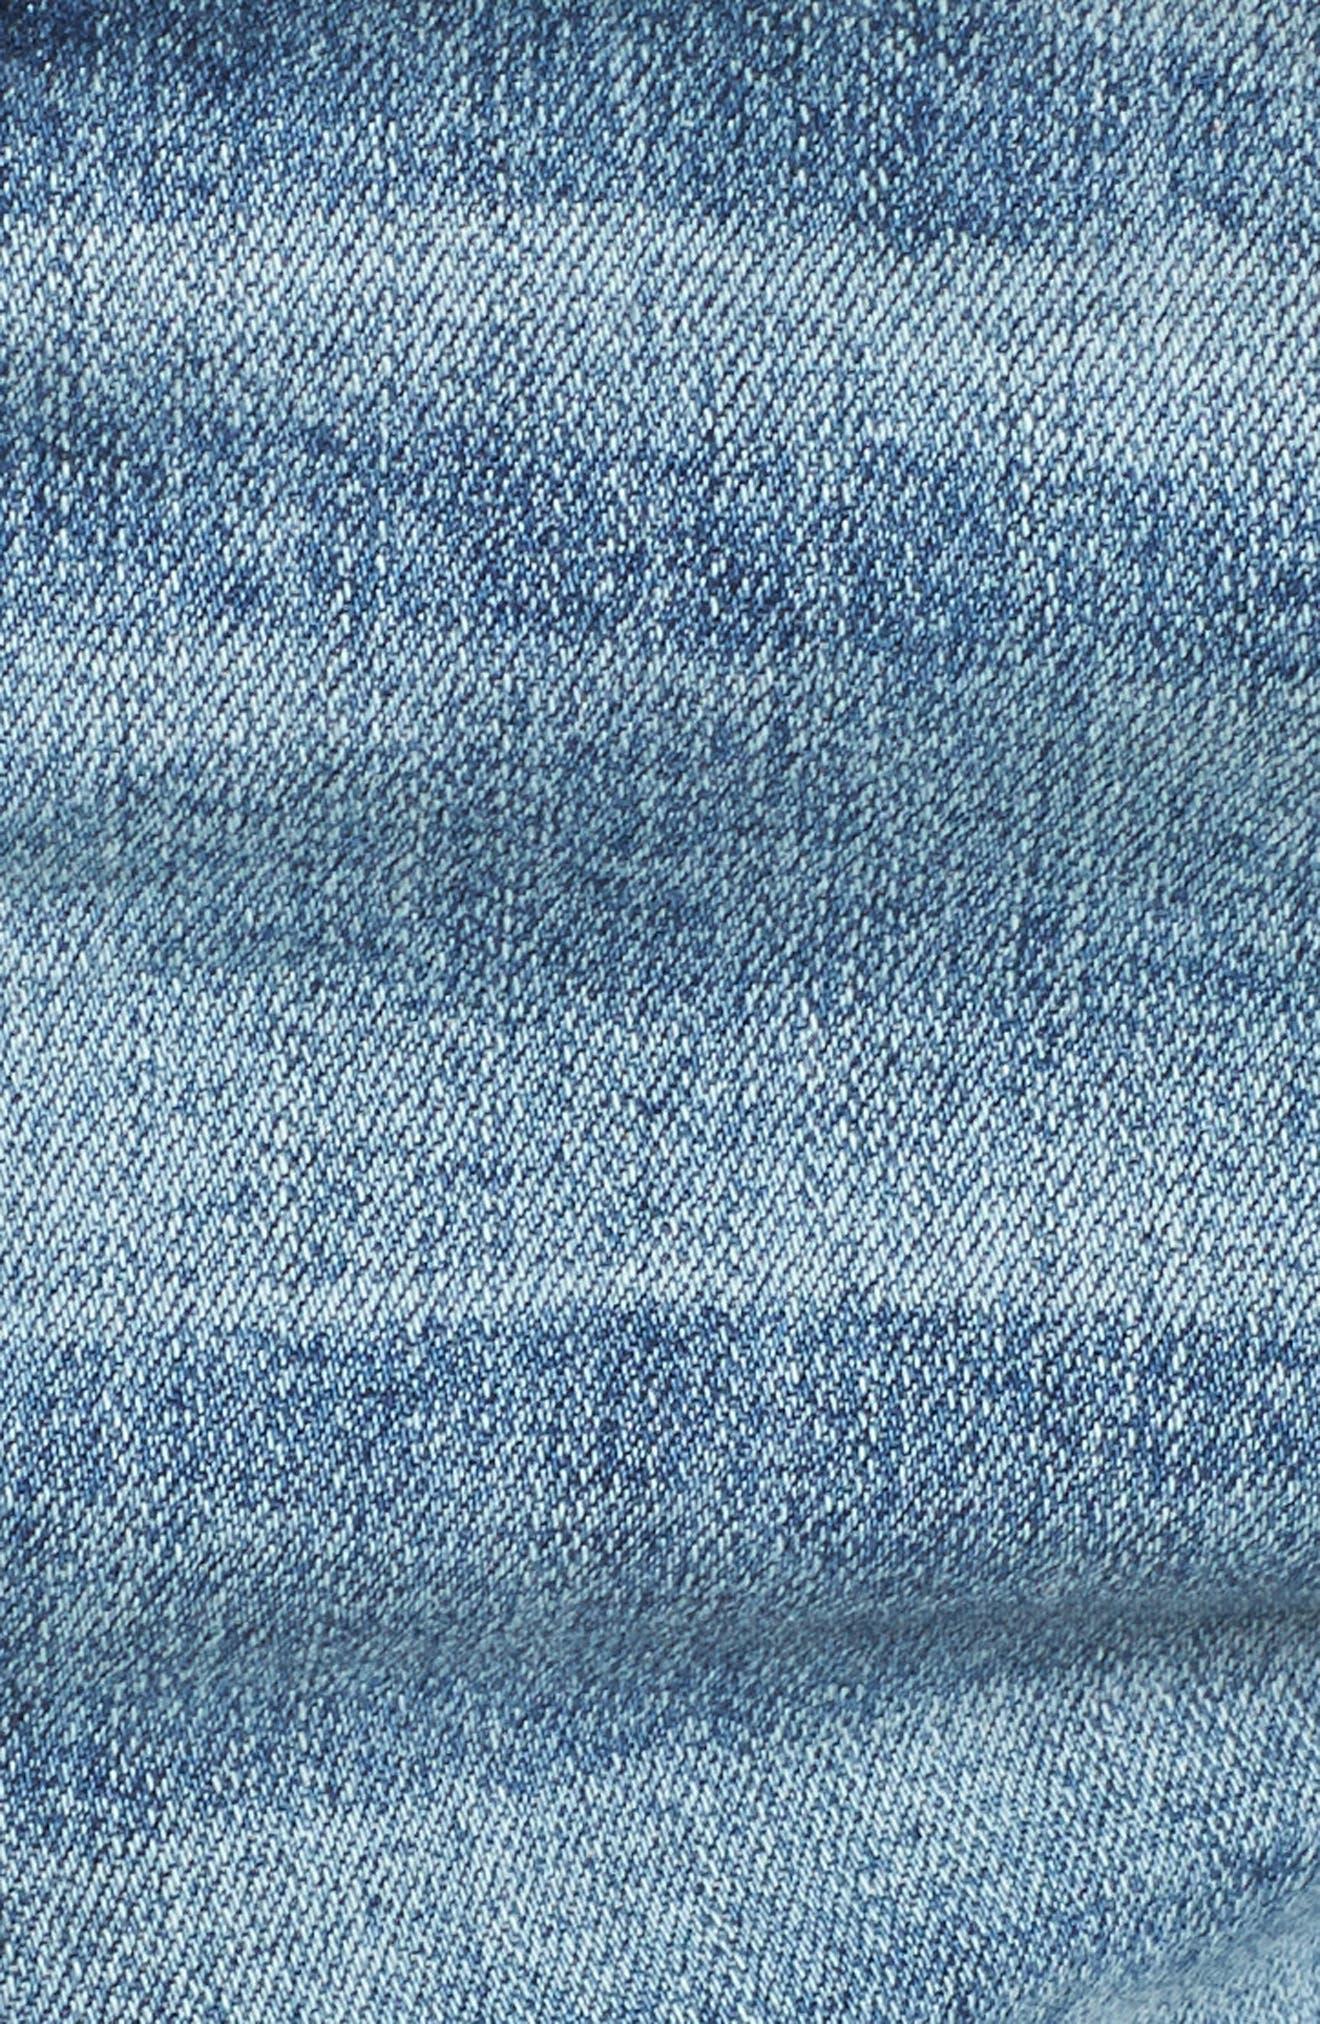 STS Blue Distressed High Waist Denim Shorts,                             Alternate thumbnail 6, color,                             RIVINDEL W/ LT BASE